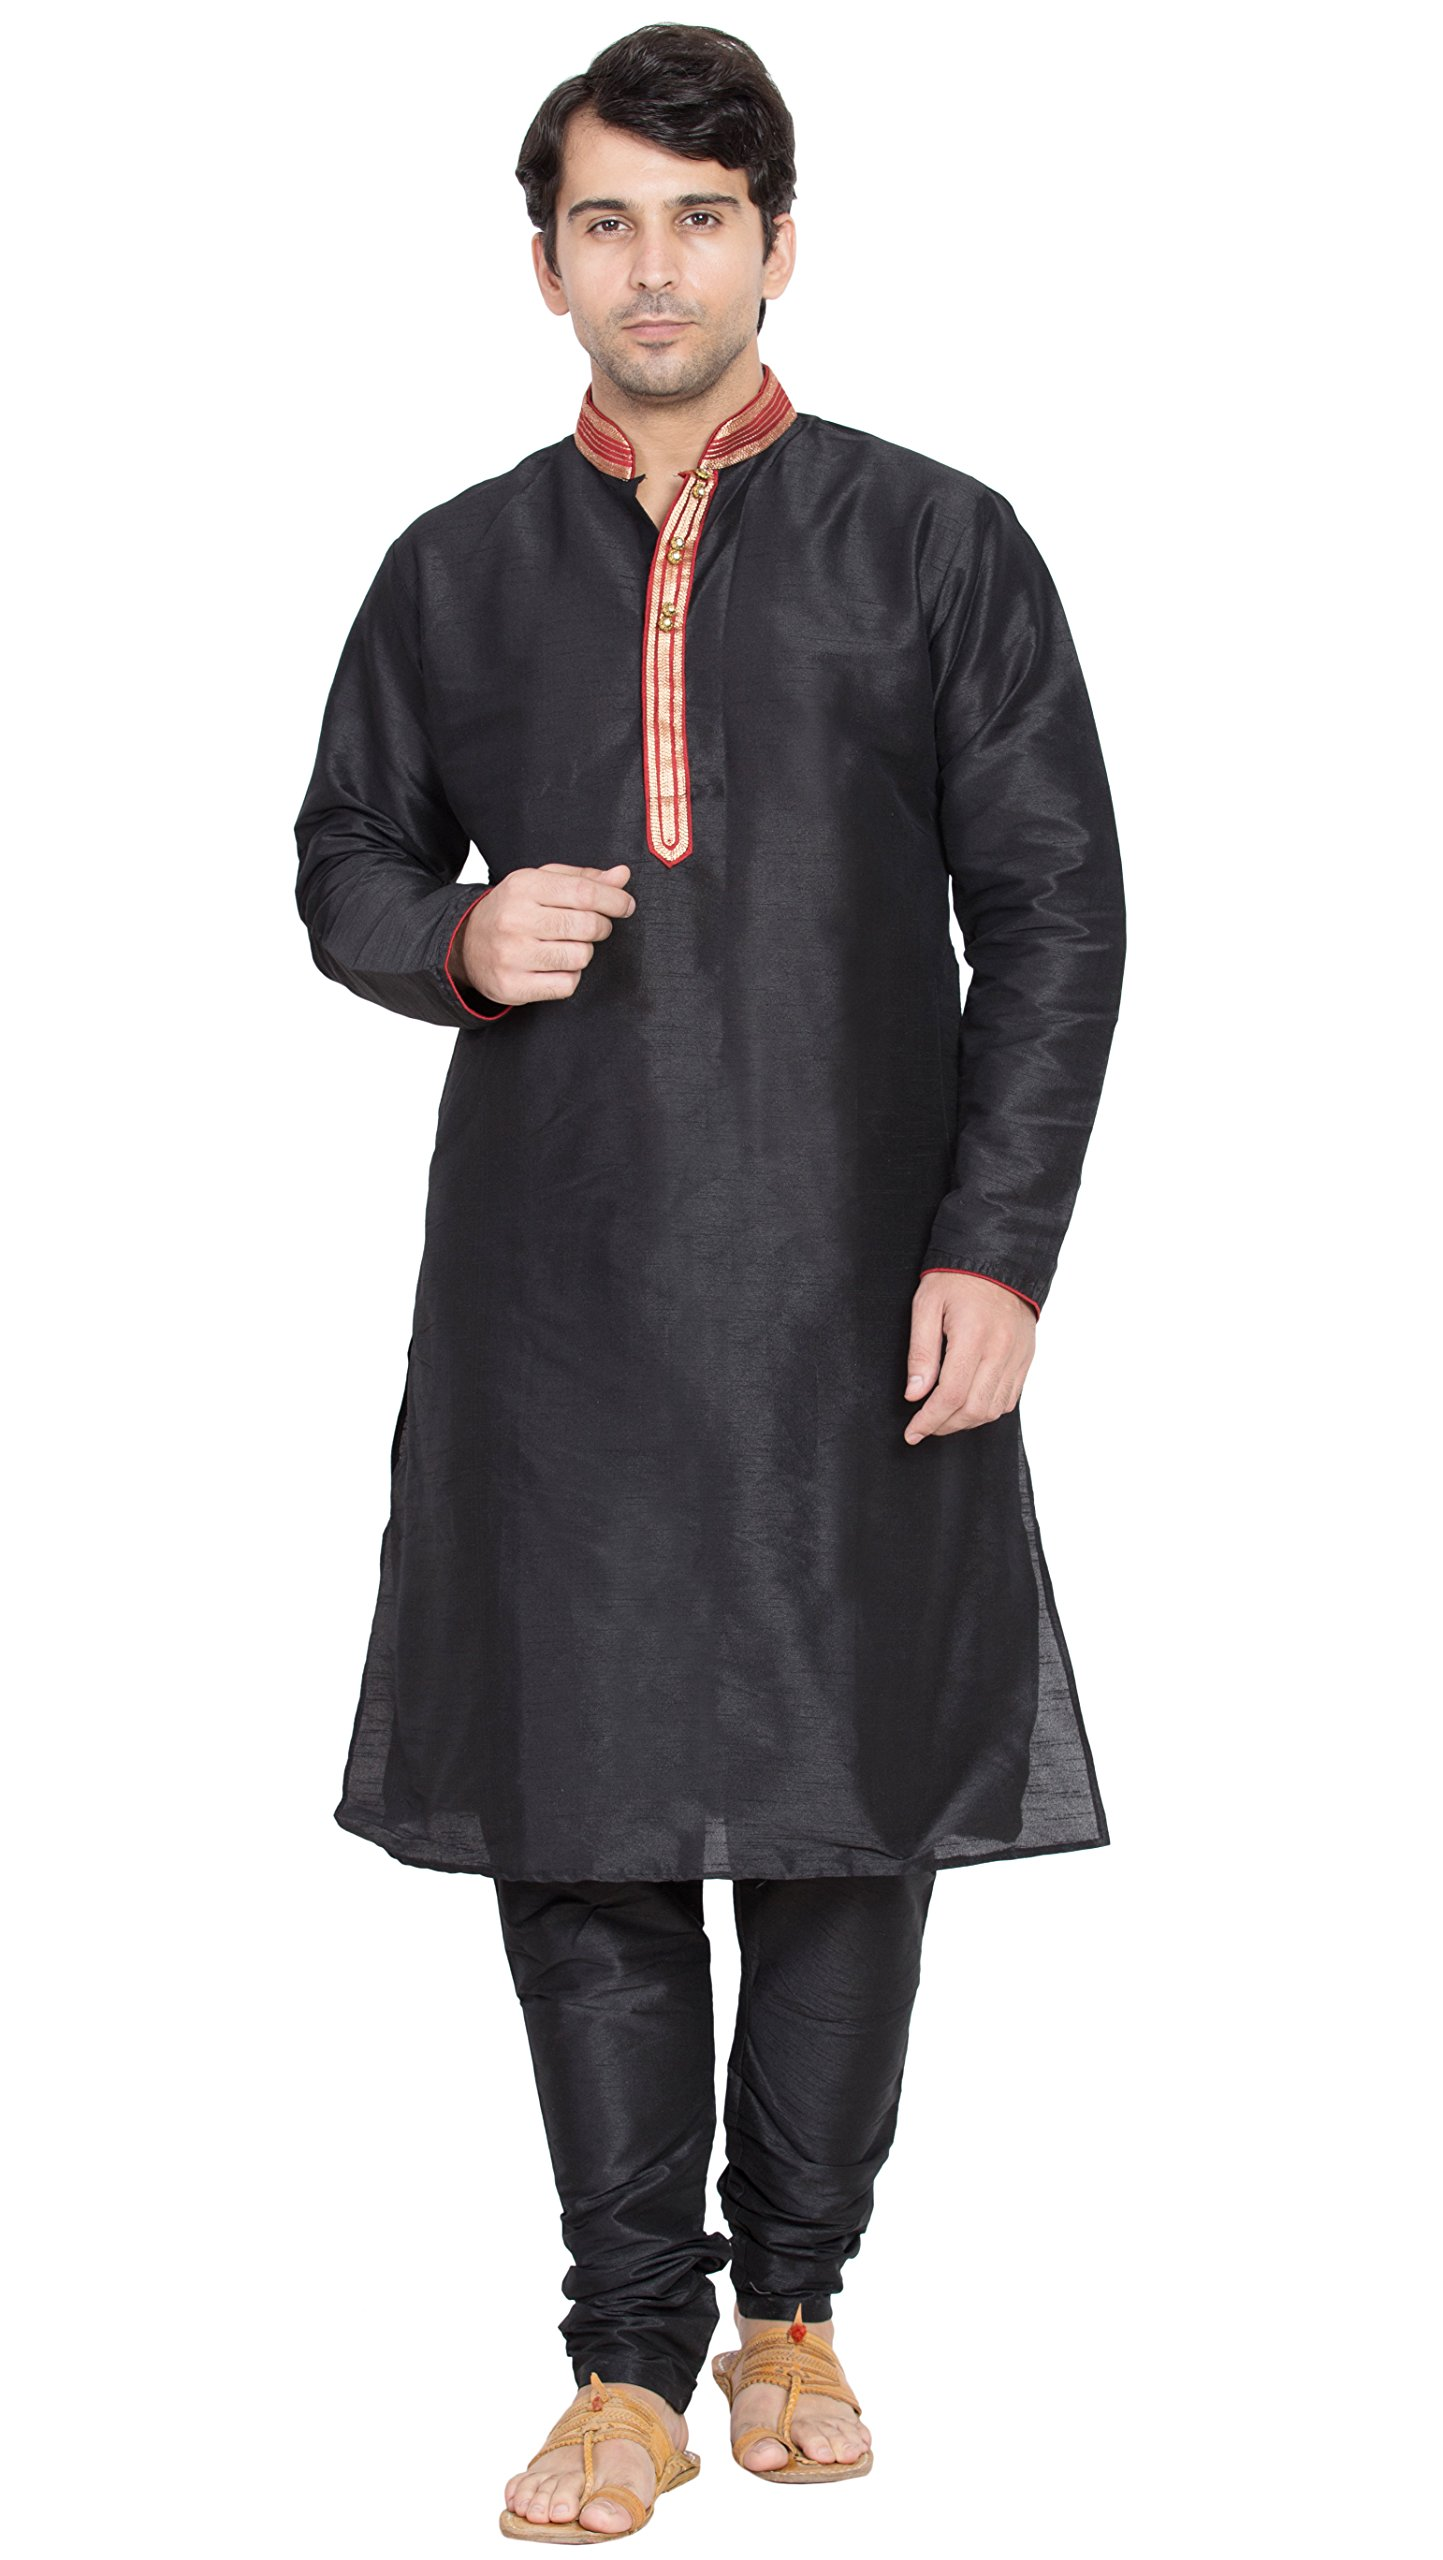 Mens Black Kurta Pajama Long Sleeve Shirt Indian Clothing Fashion Ethnic Dress -L